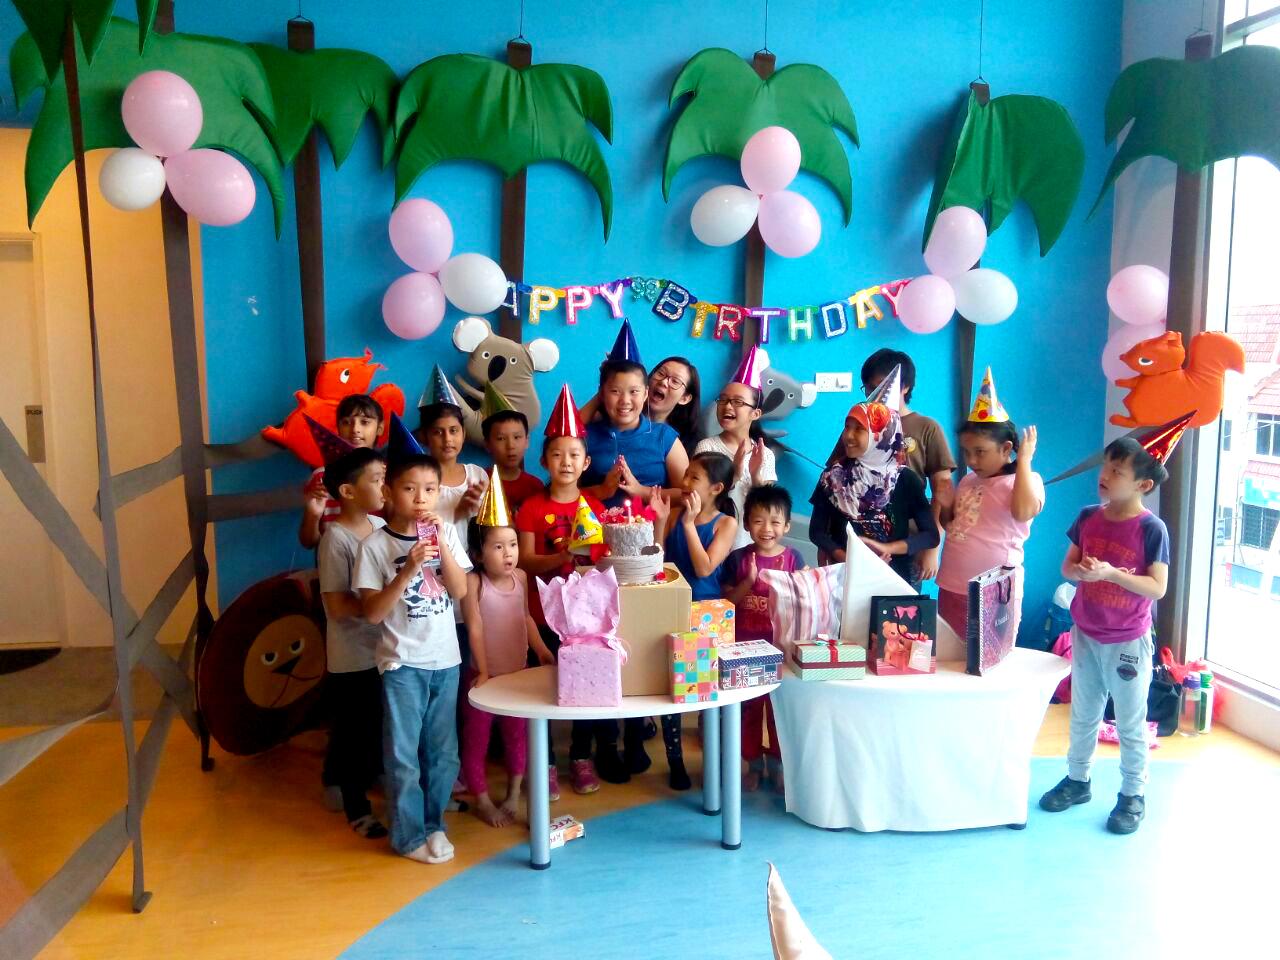 Birthday party for kids inKuala Lumpur, Subang Jaya, Selangor, Klang Valley